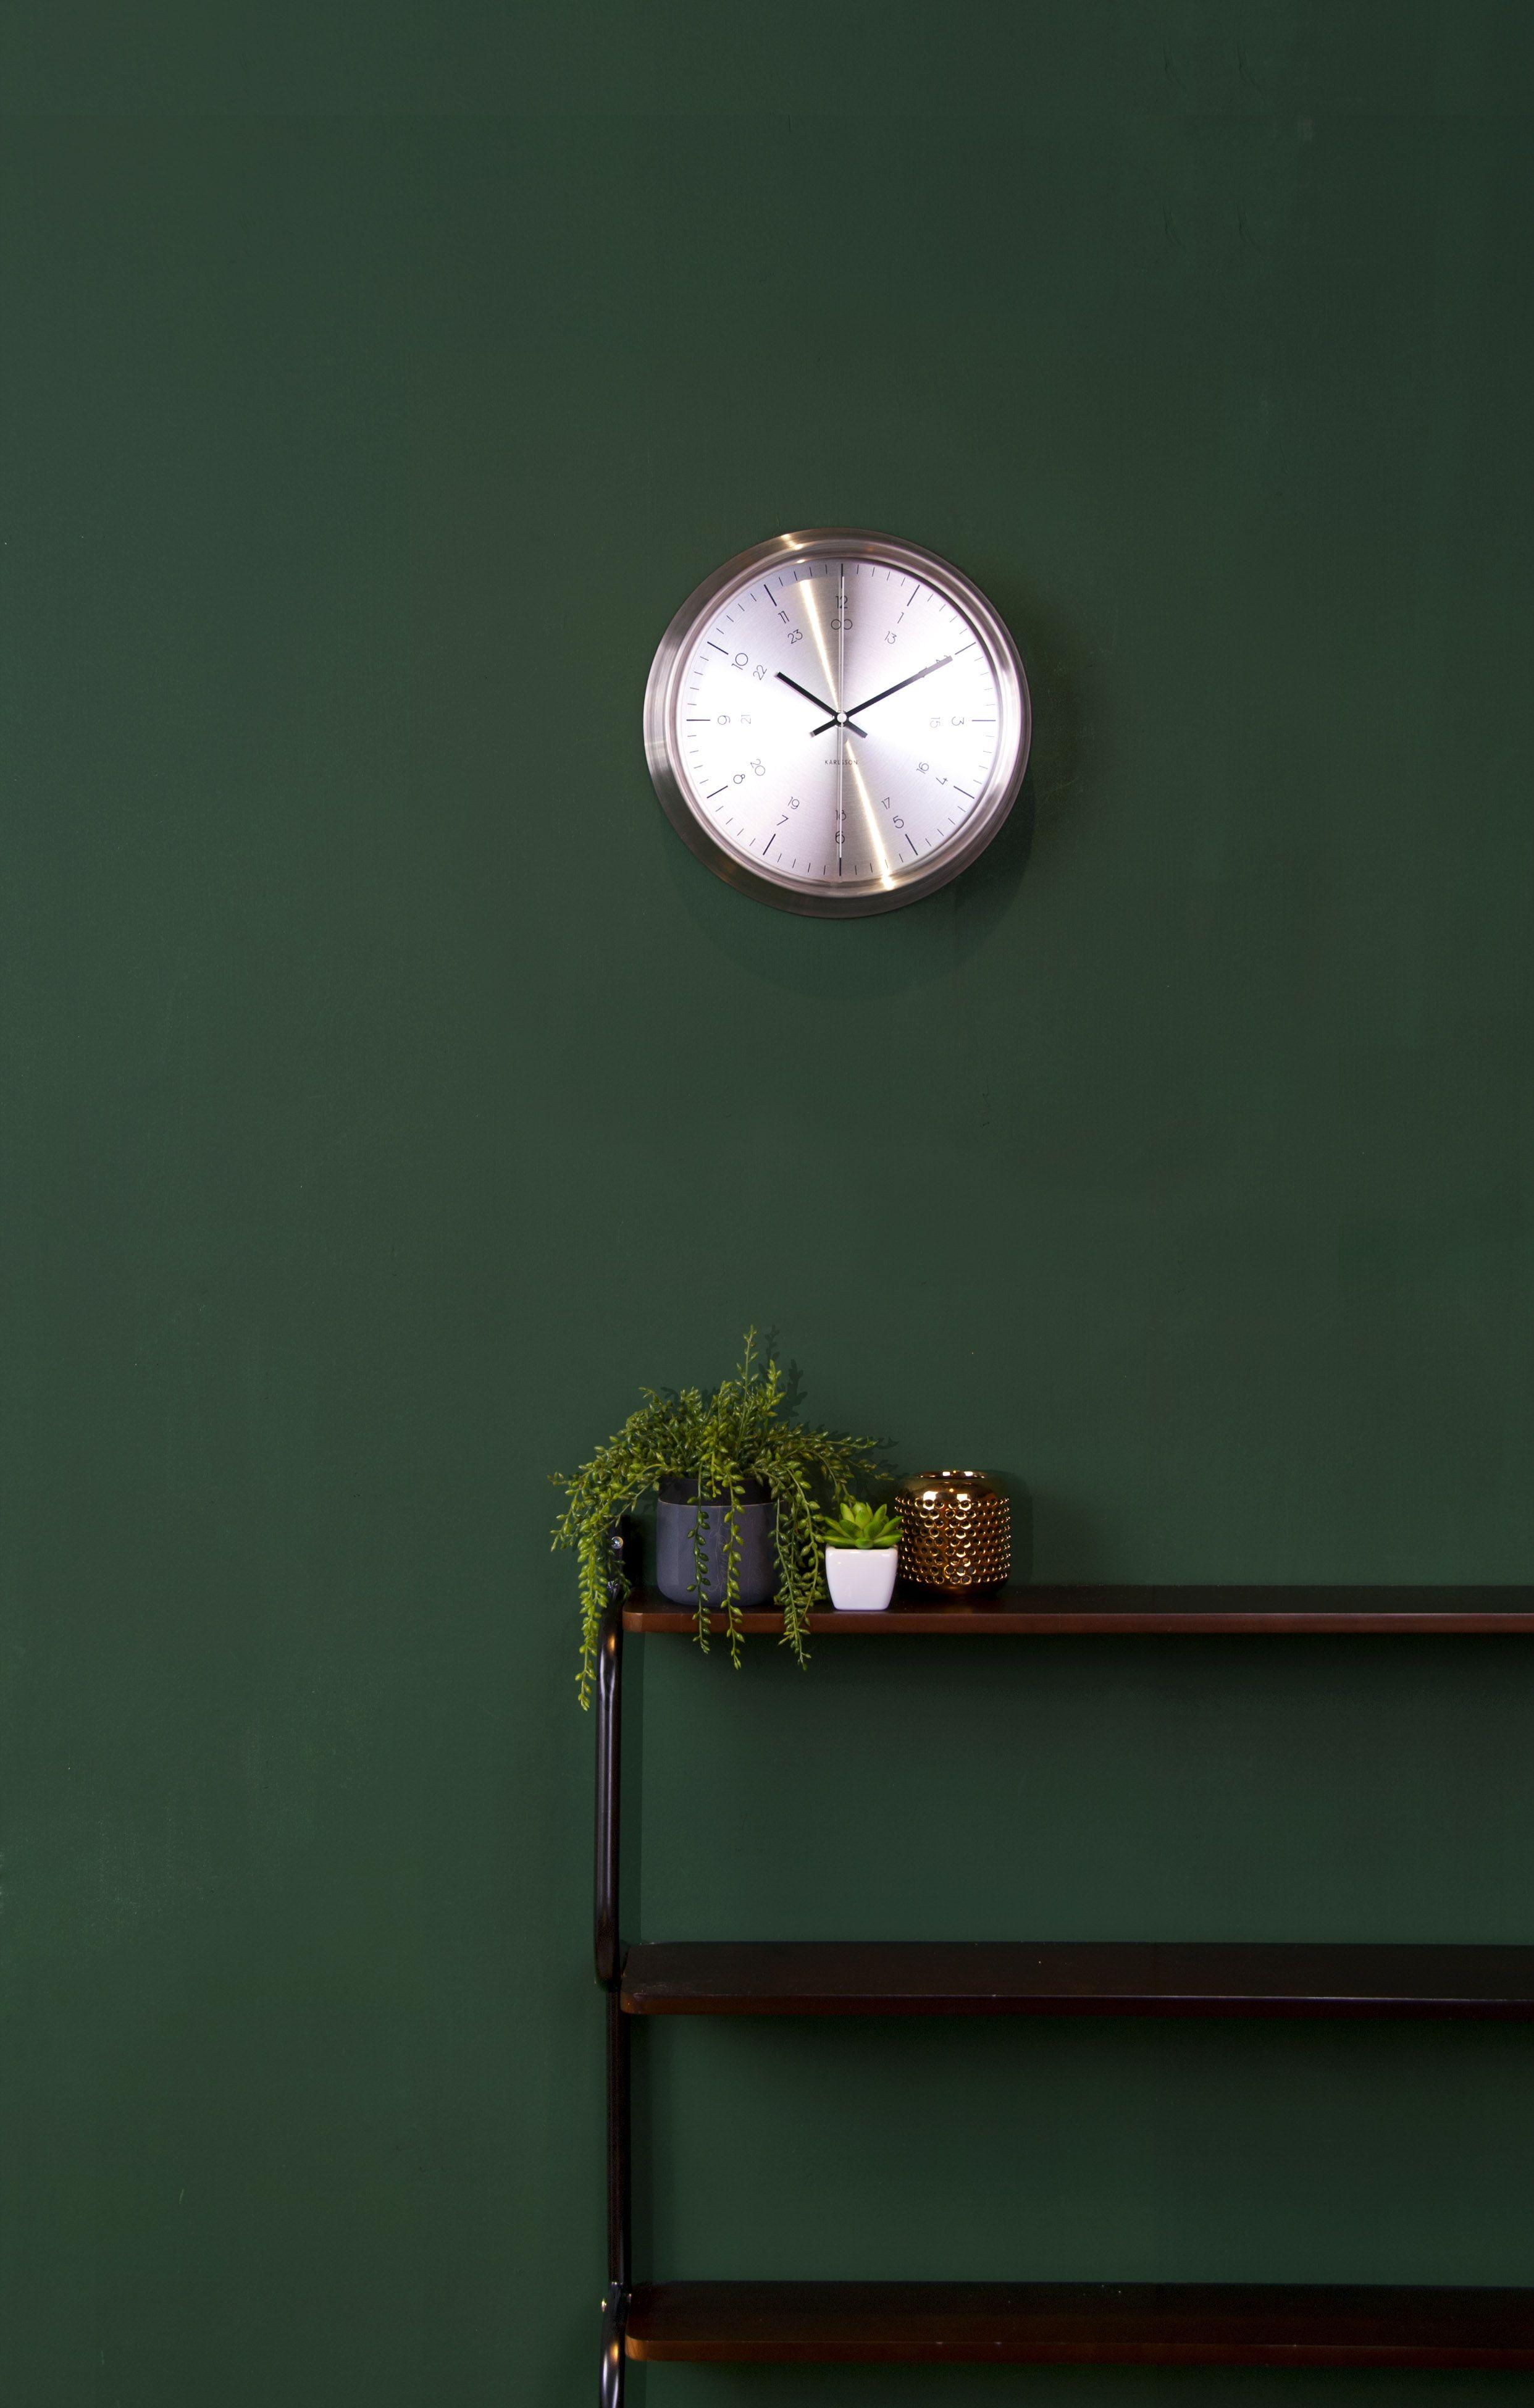 Dark green paint colors - Tea Light Holders Artificial Plants Clocks Ptliving Ptproducts Karlssonclocks Dark Green Wallswall Colourspaint